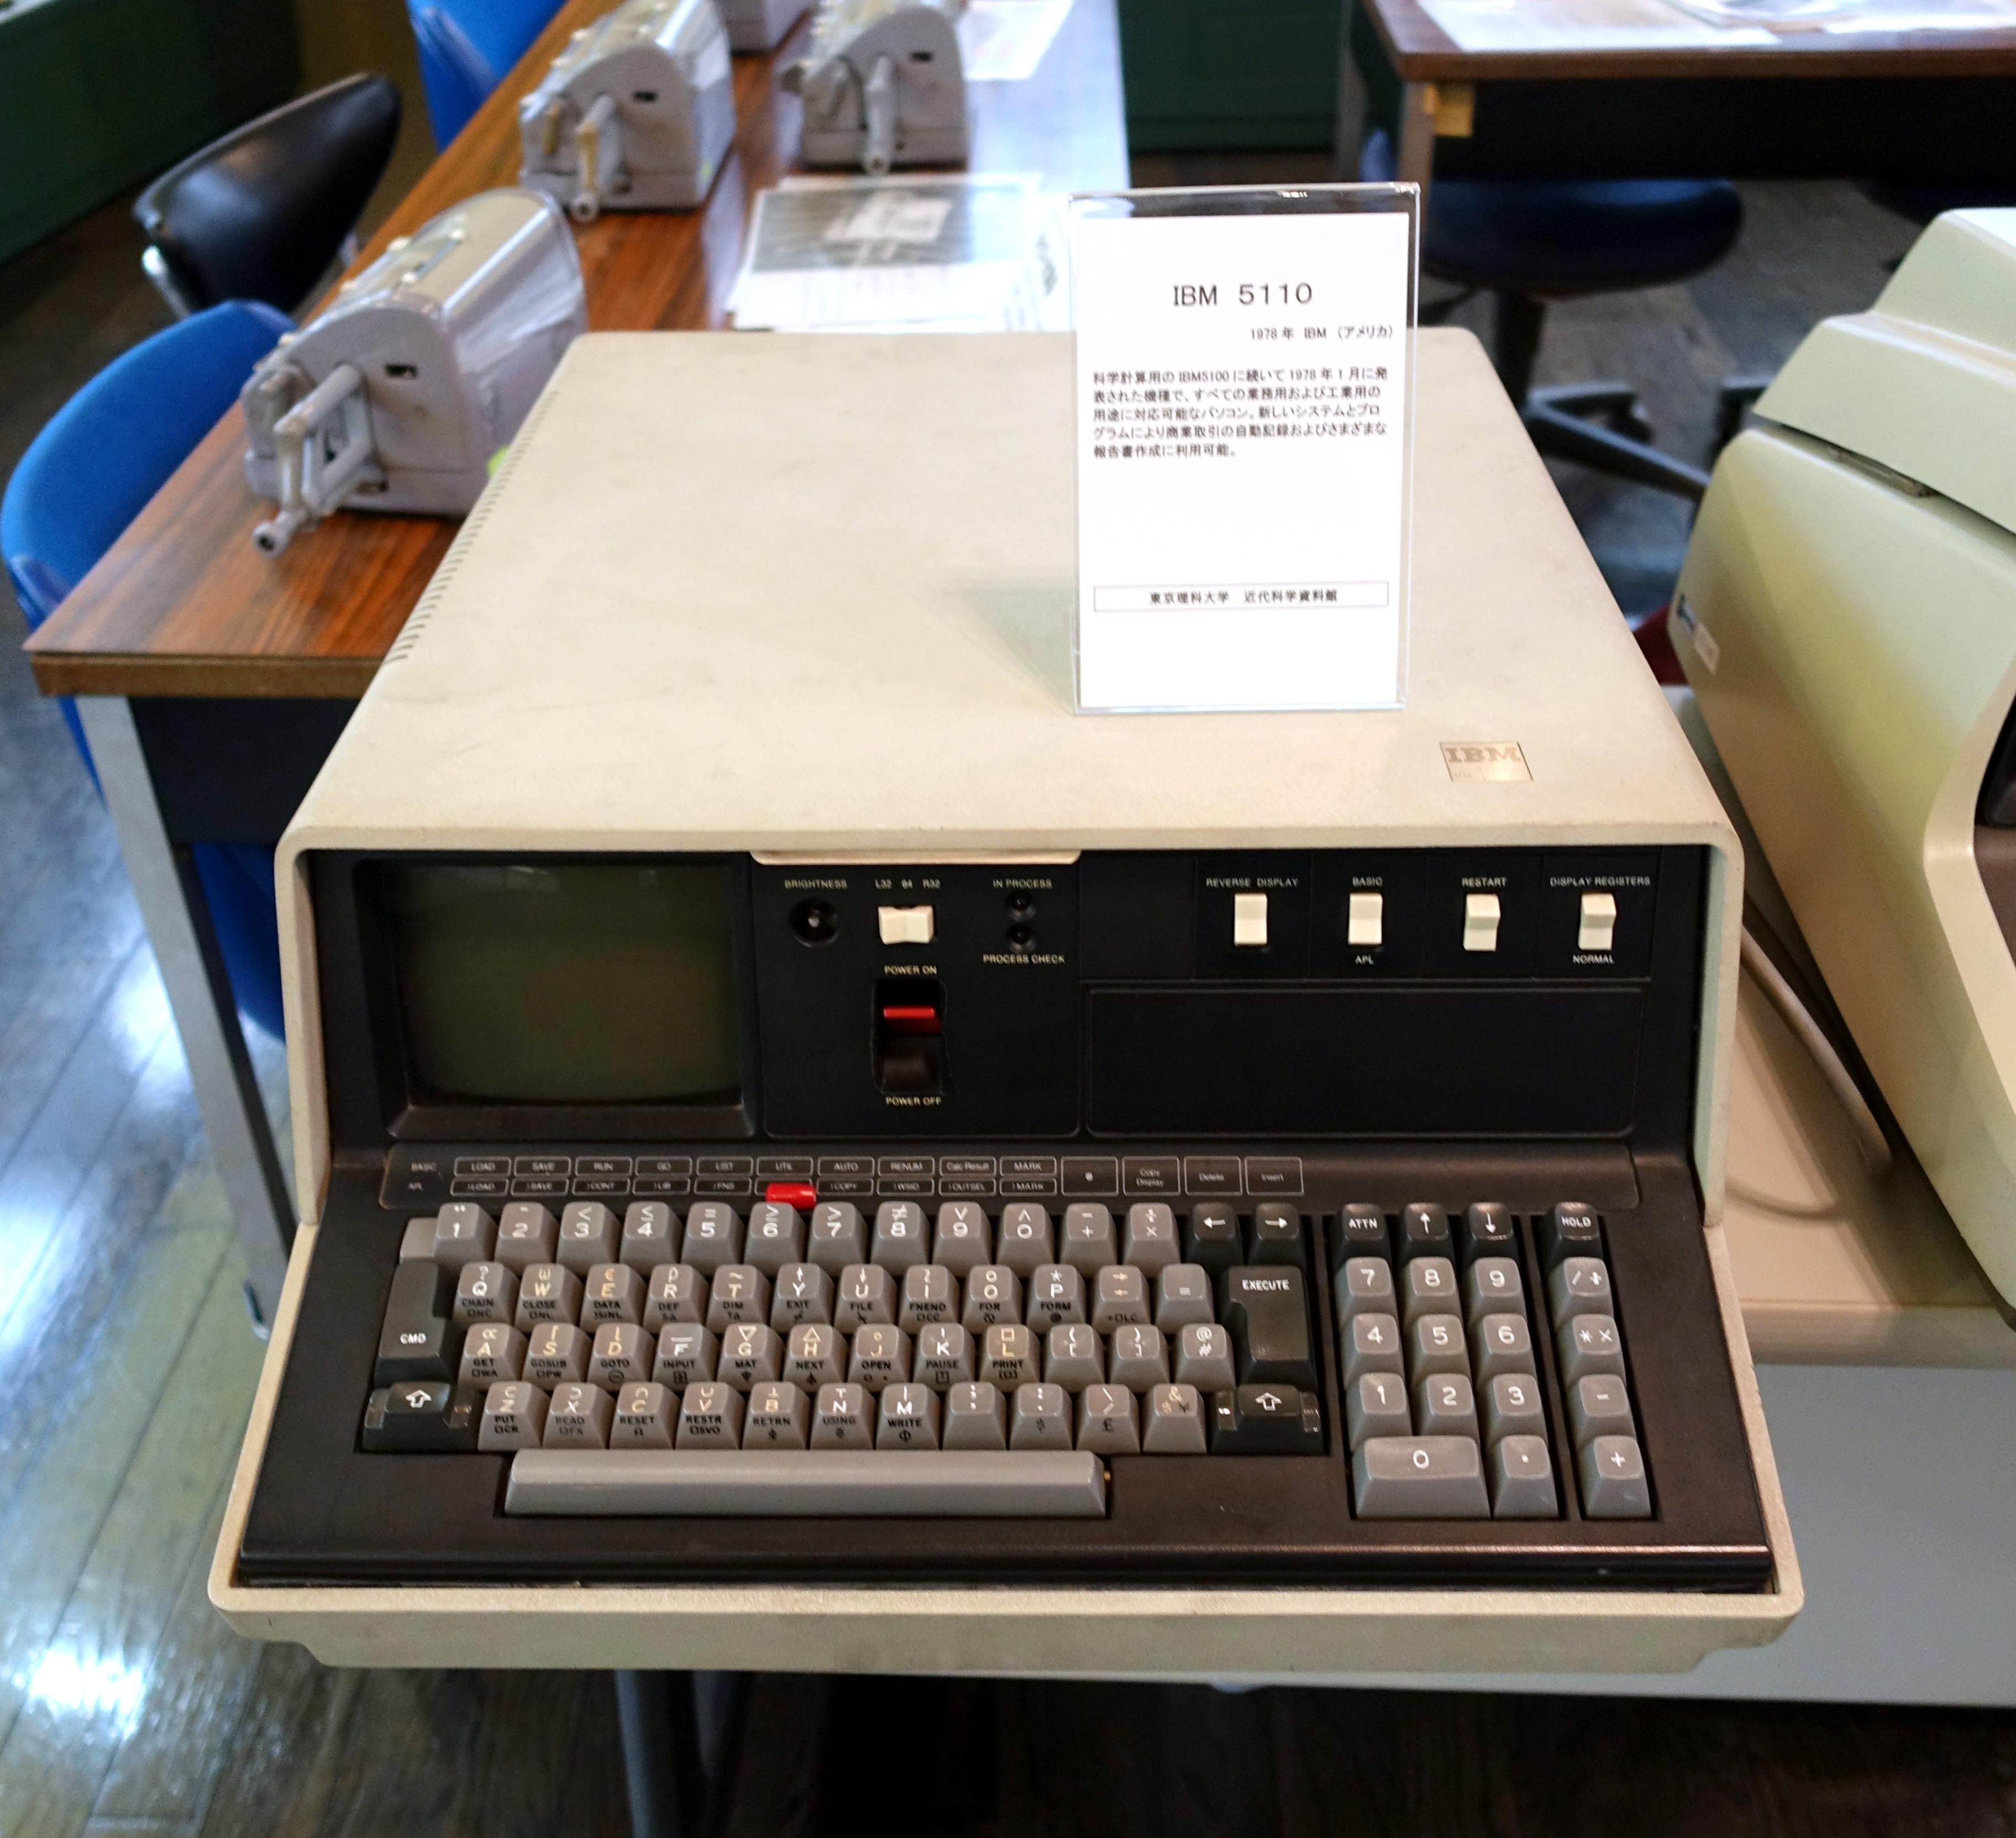 IBM 5110 - Wikipedia